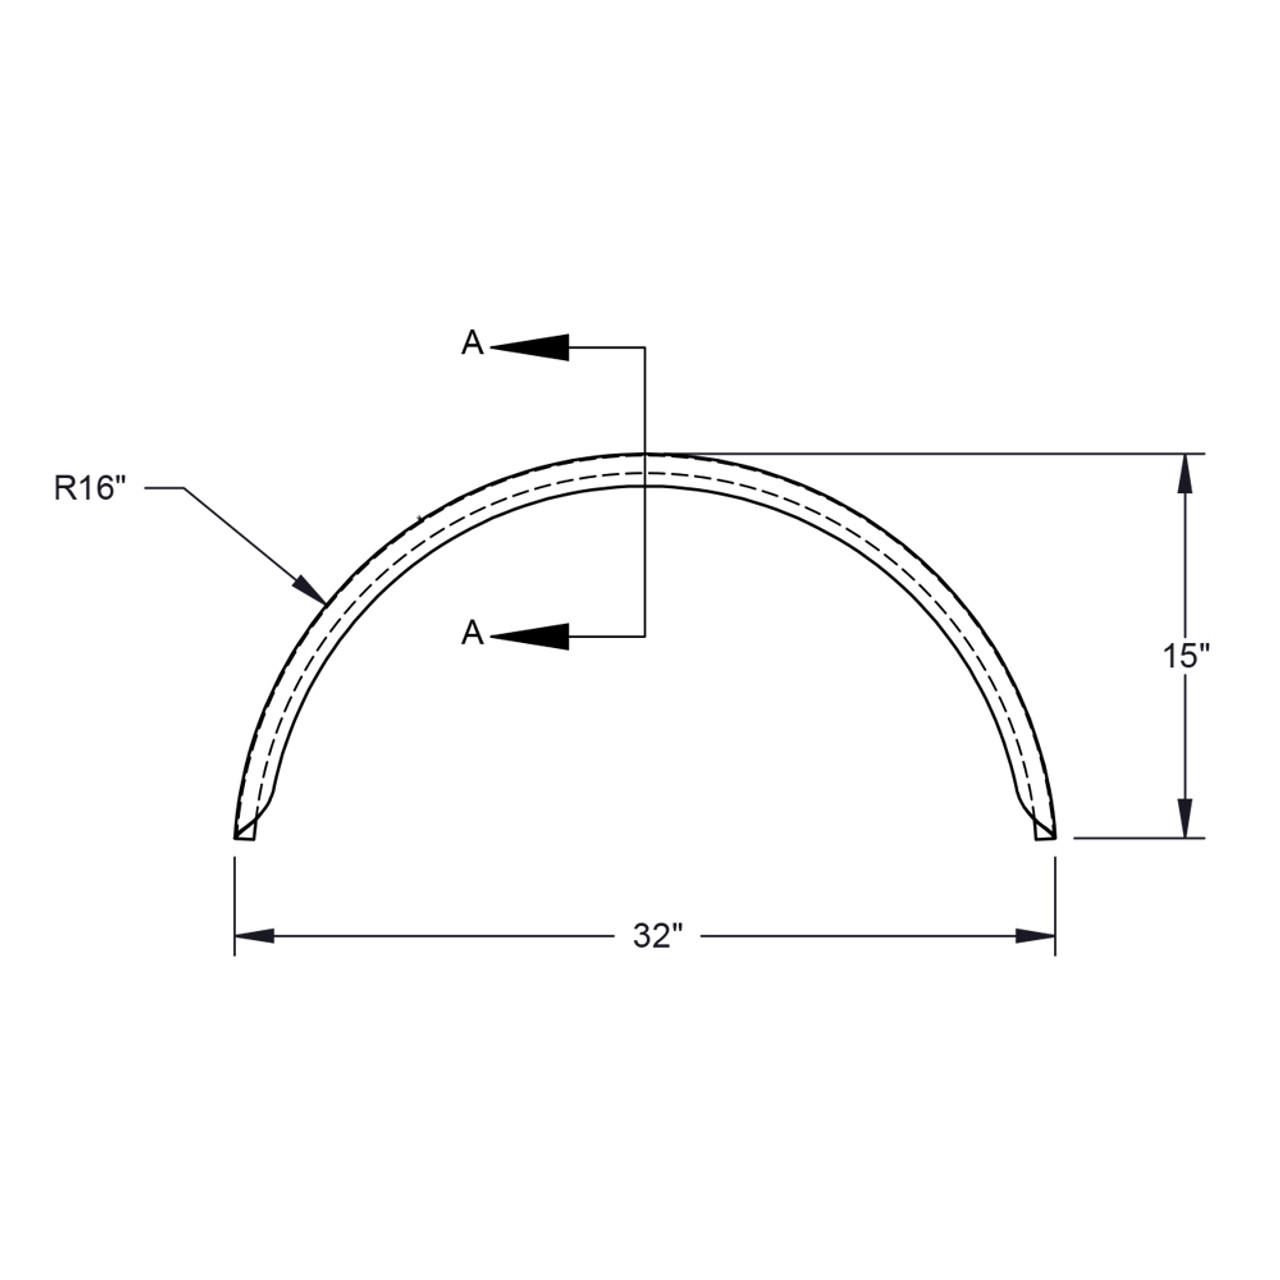 32x10-3/4 Aluminum Tread Plate Trailer Fender Single Axle Round - One Fender